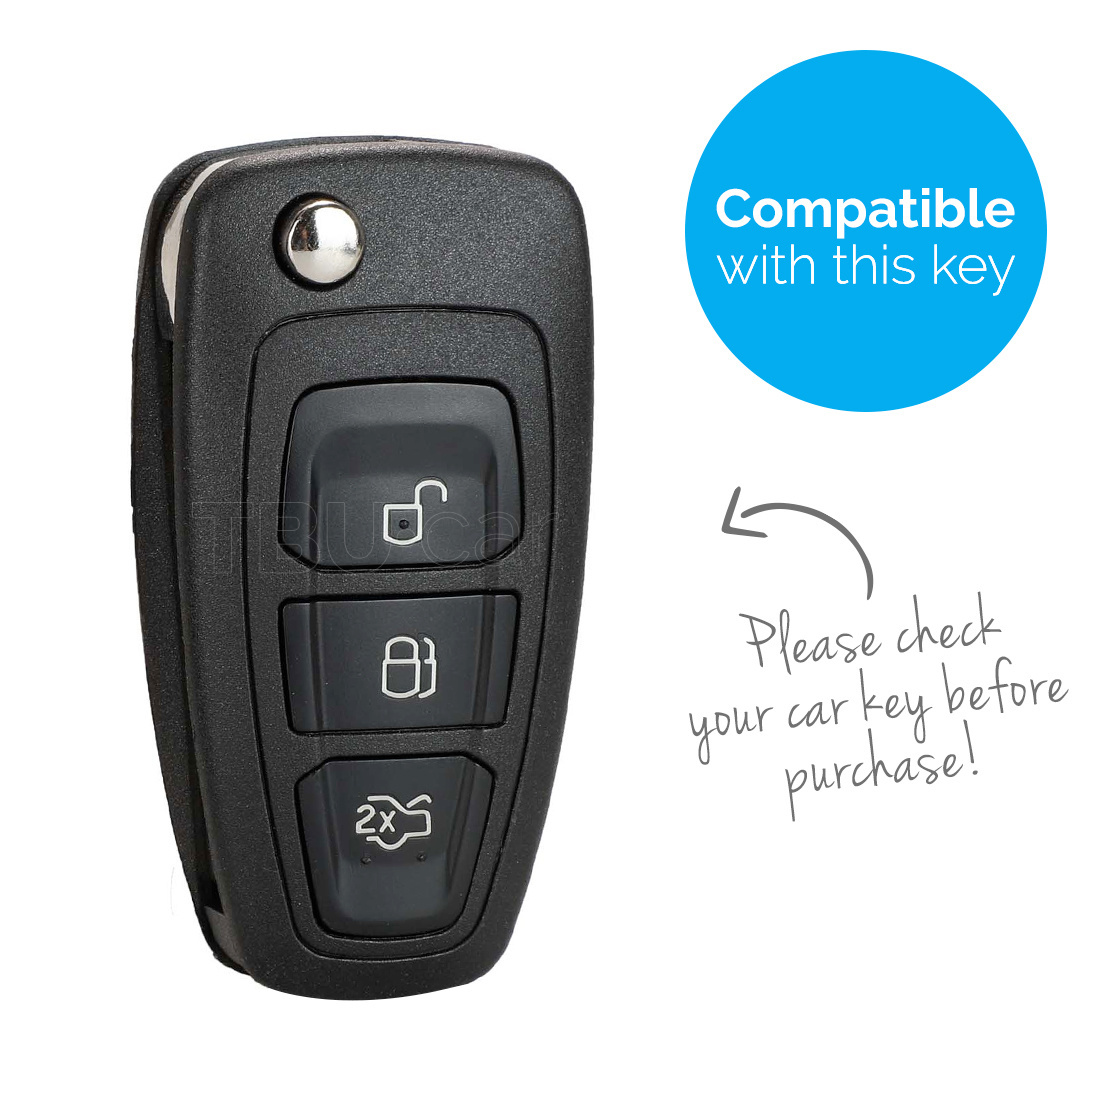 TBU car TBU car Sleutel cover compatibel met Ford - Silicone sleutelhoesje - beschermhoesje autosleutel - Blauw